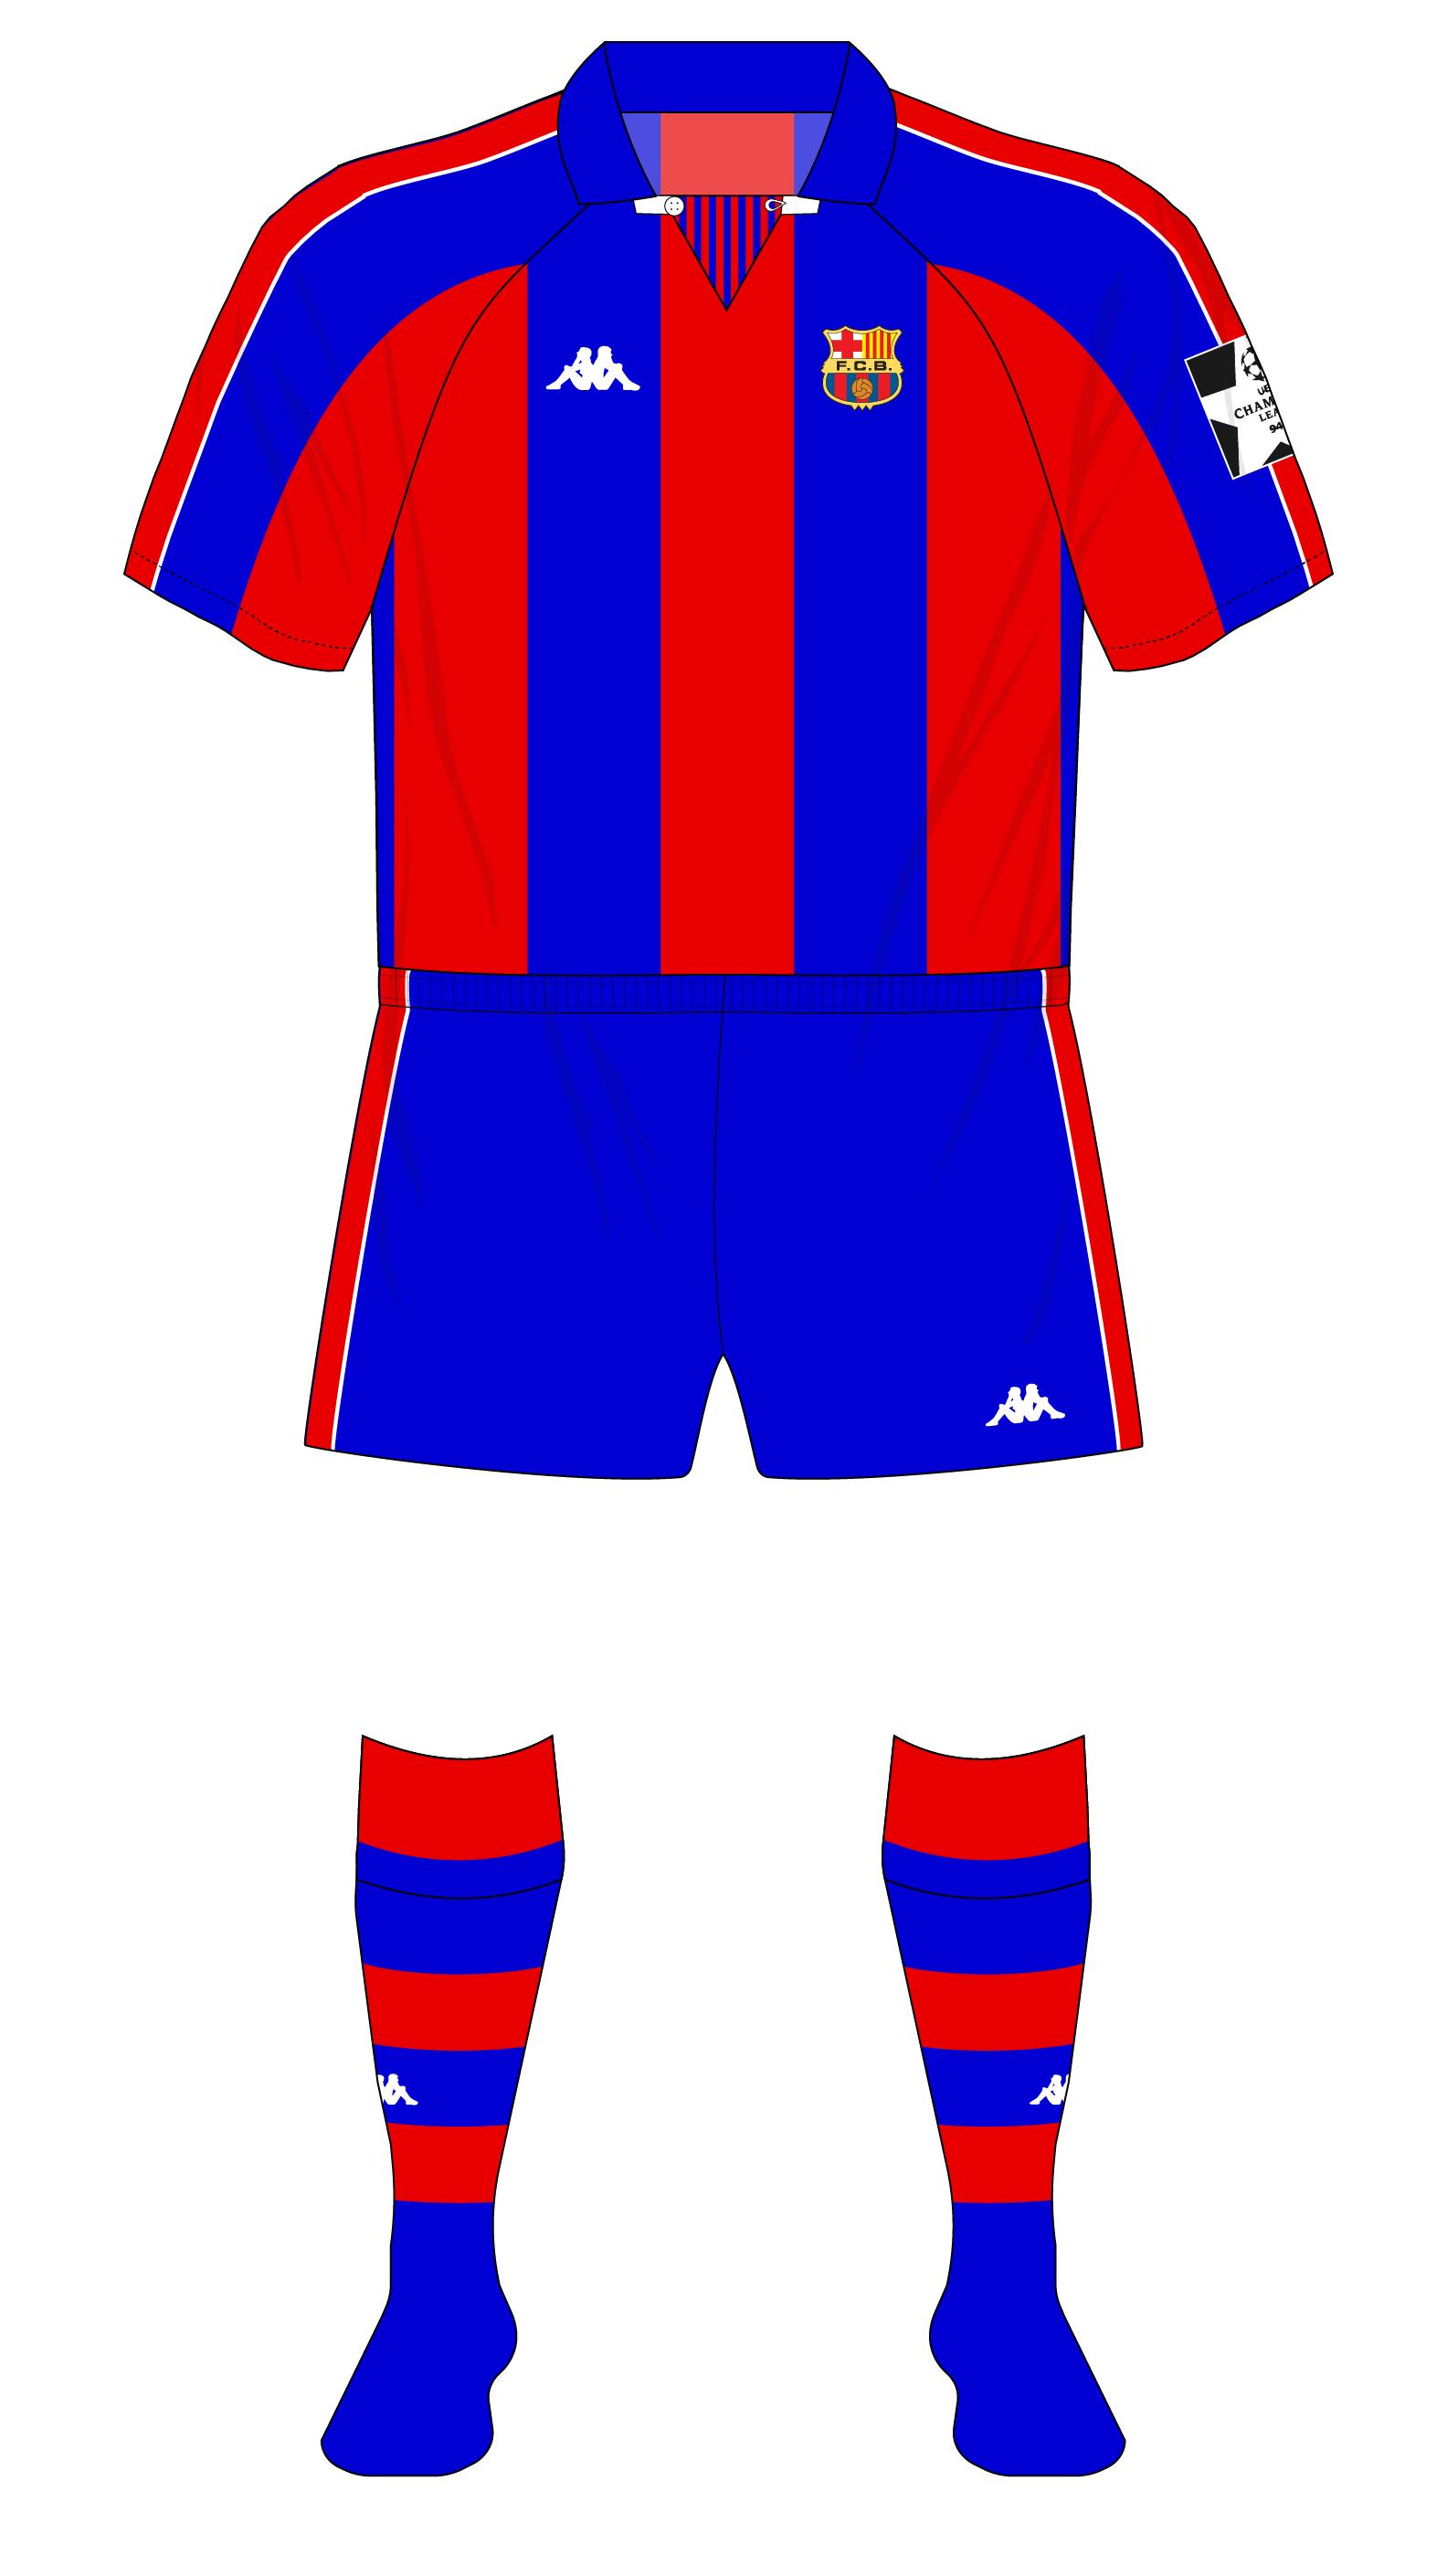 online store c0b68 43e8f Barcelona-1994-1995-Kappa-European-kit-01 | RB Jerseys